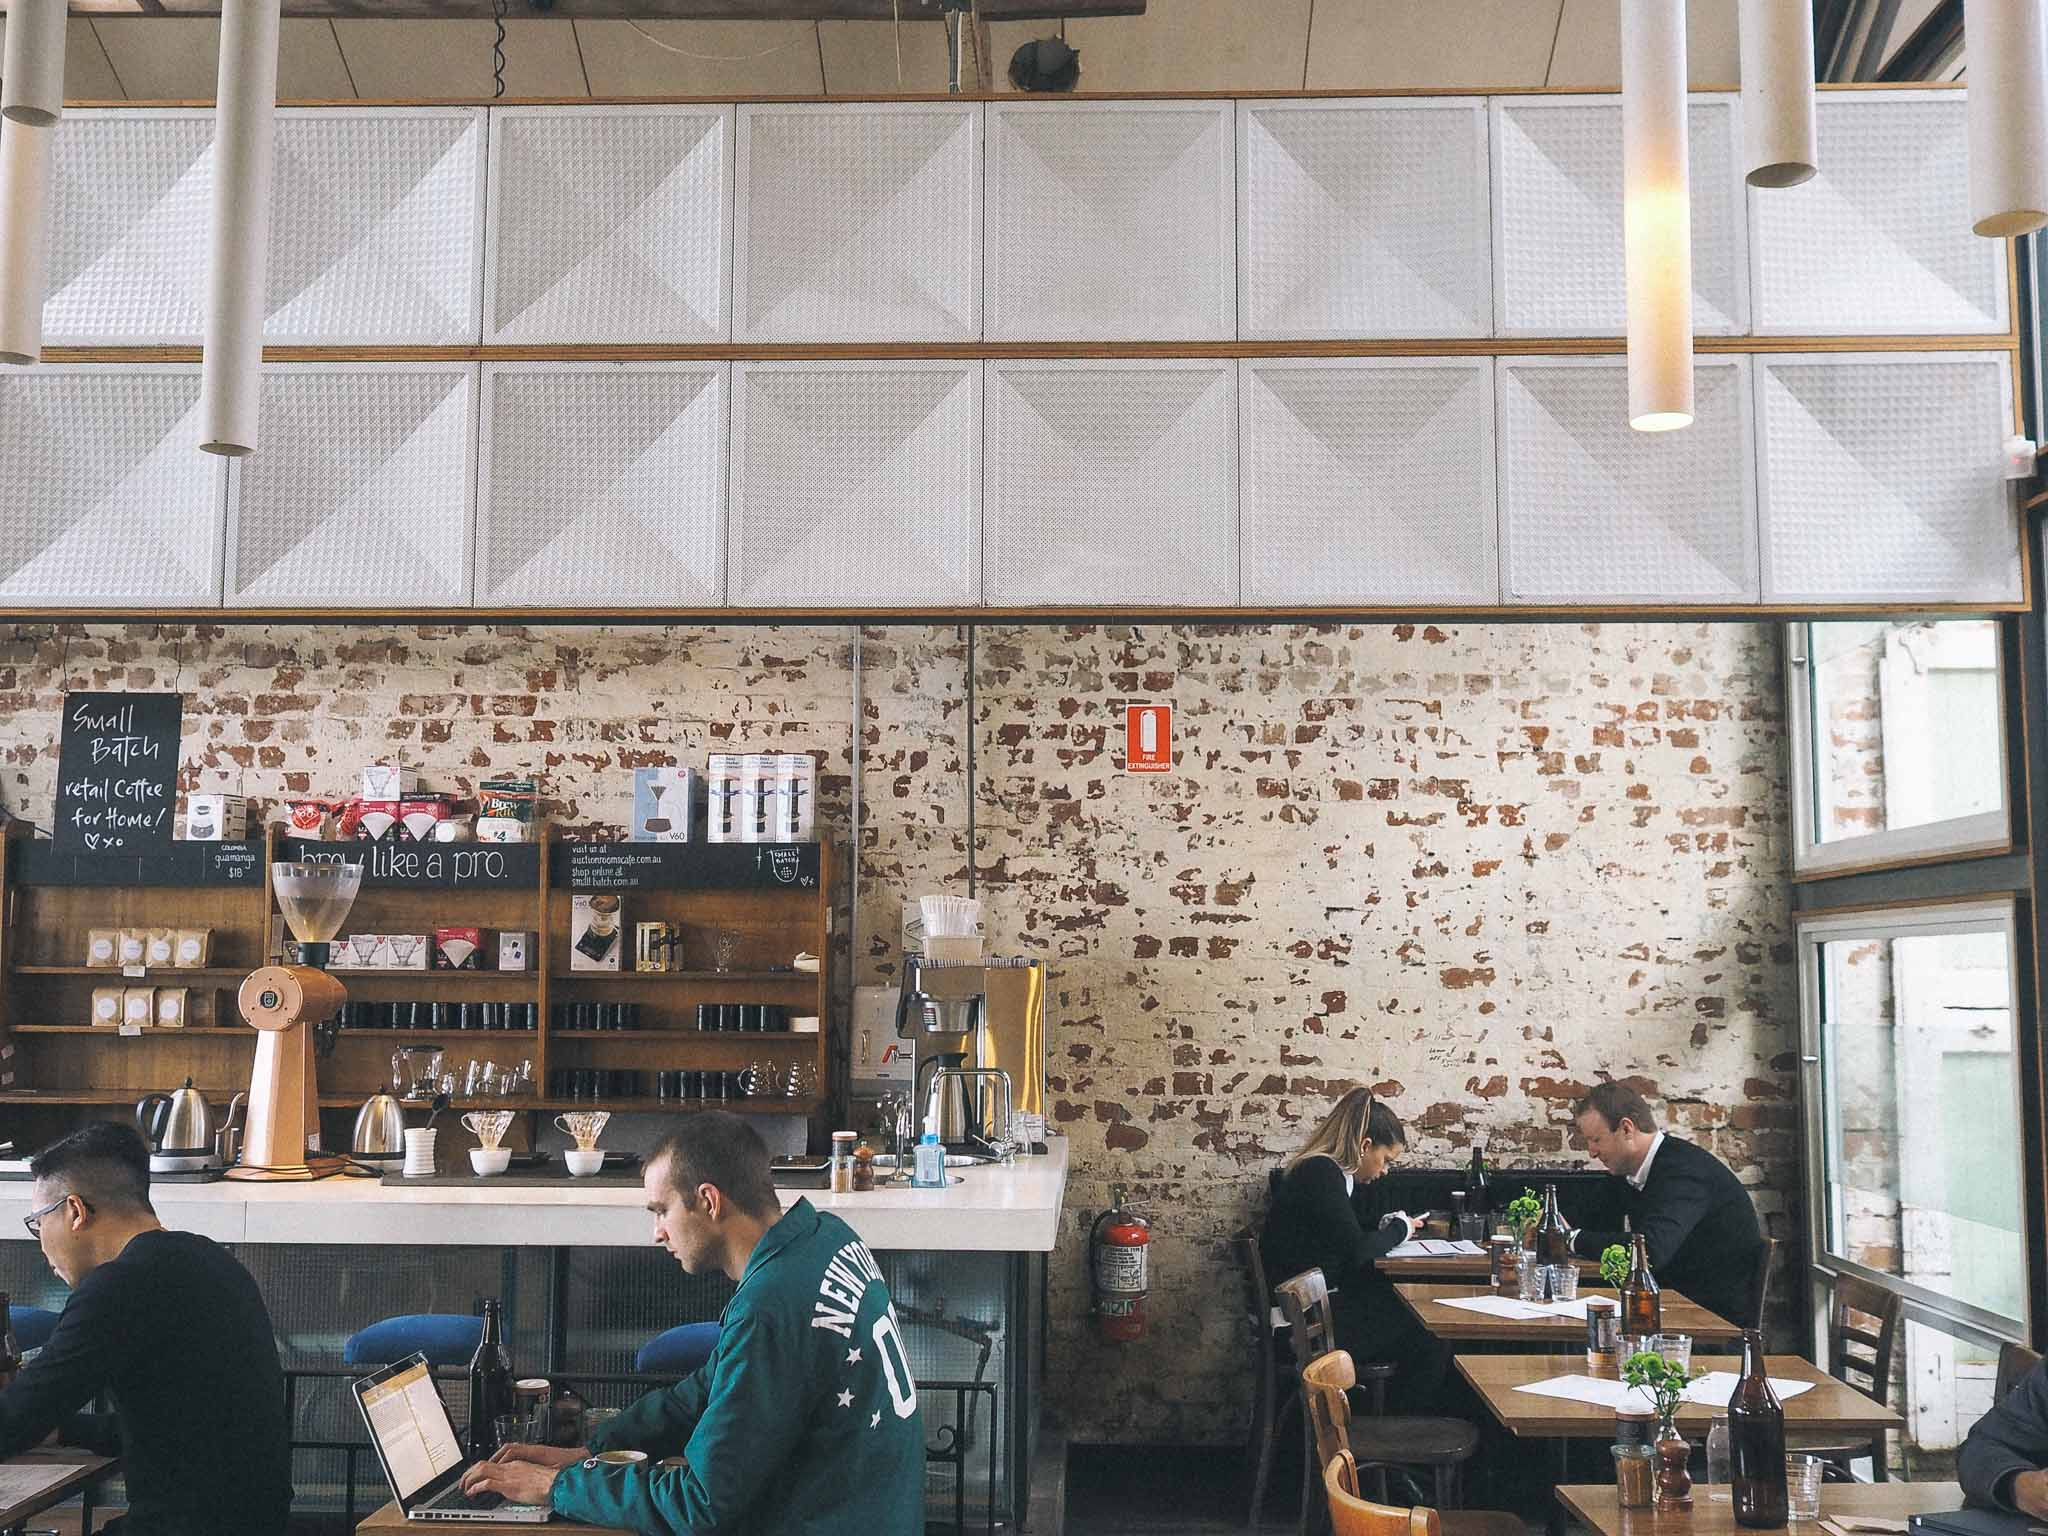 201508_Melbourne-251.jpg